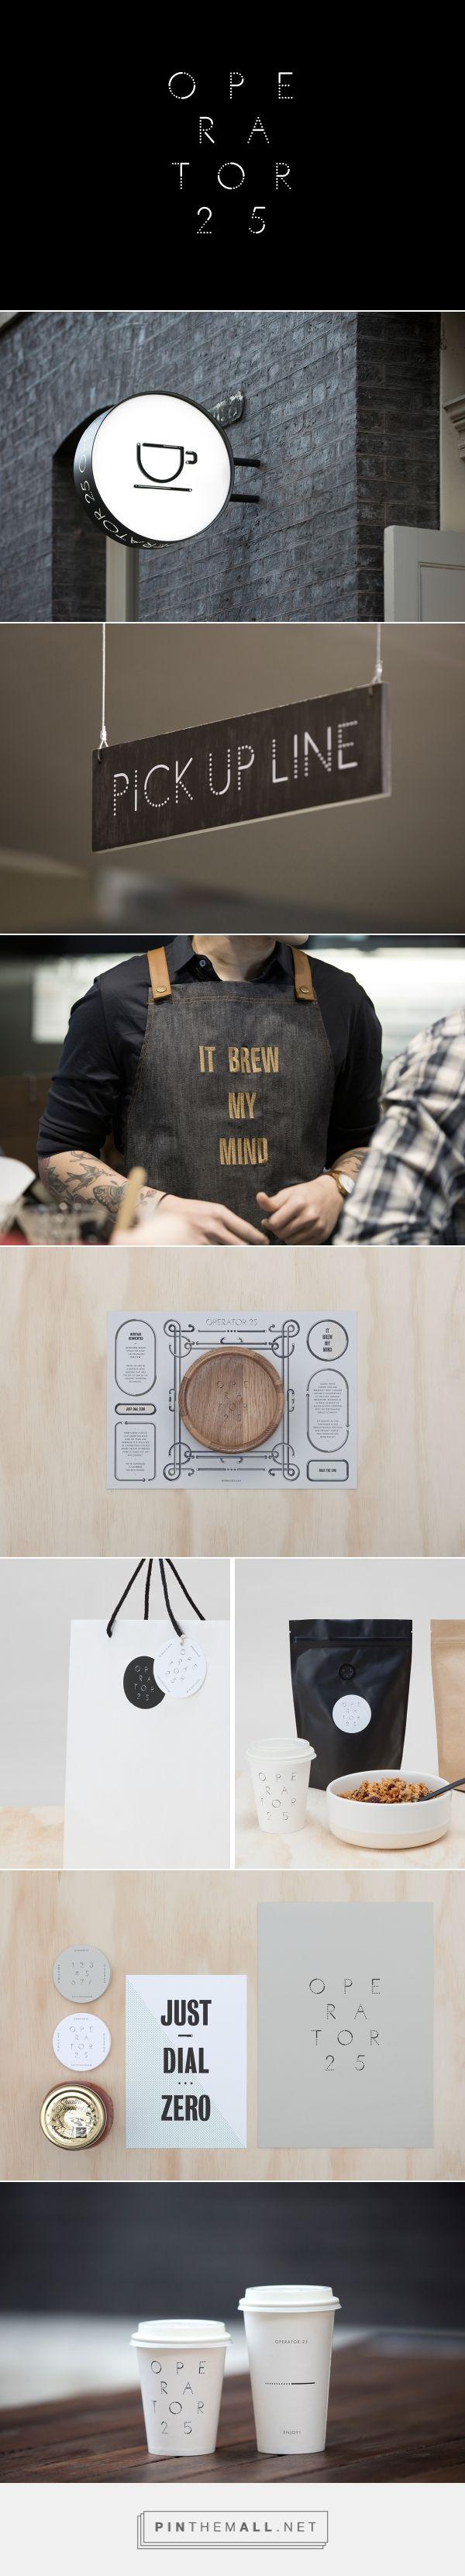 The Design Blog - Design Inspiration - created on 2015-12-01 02:20:37